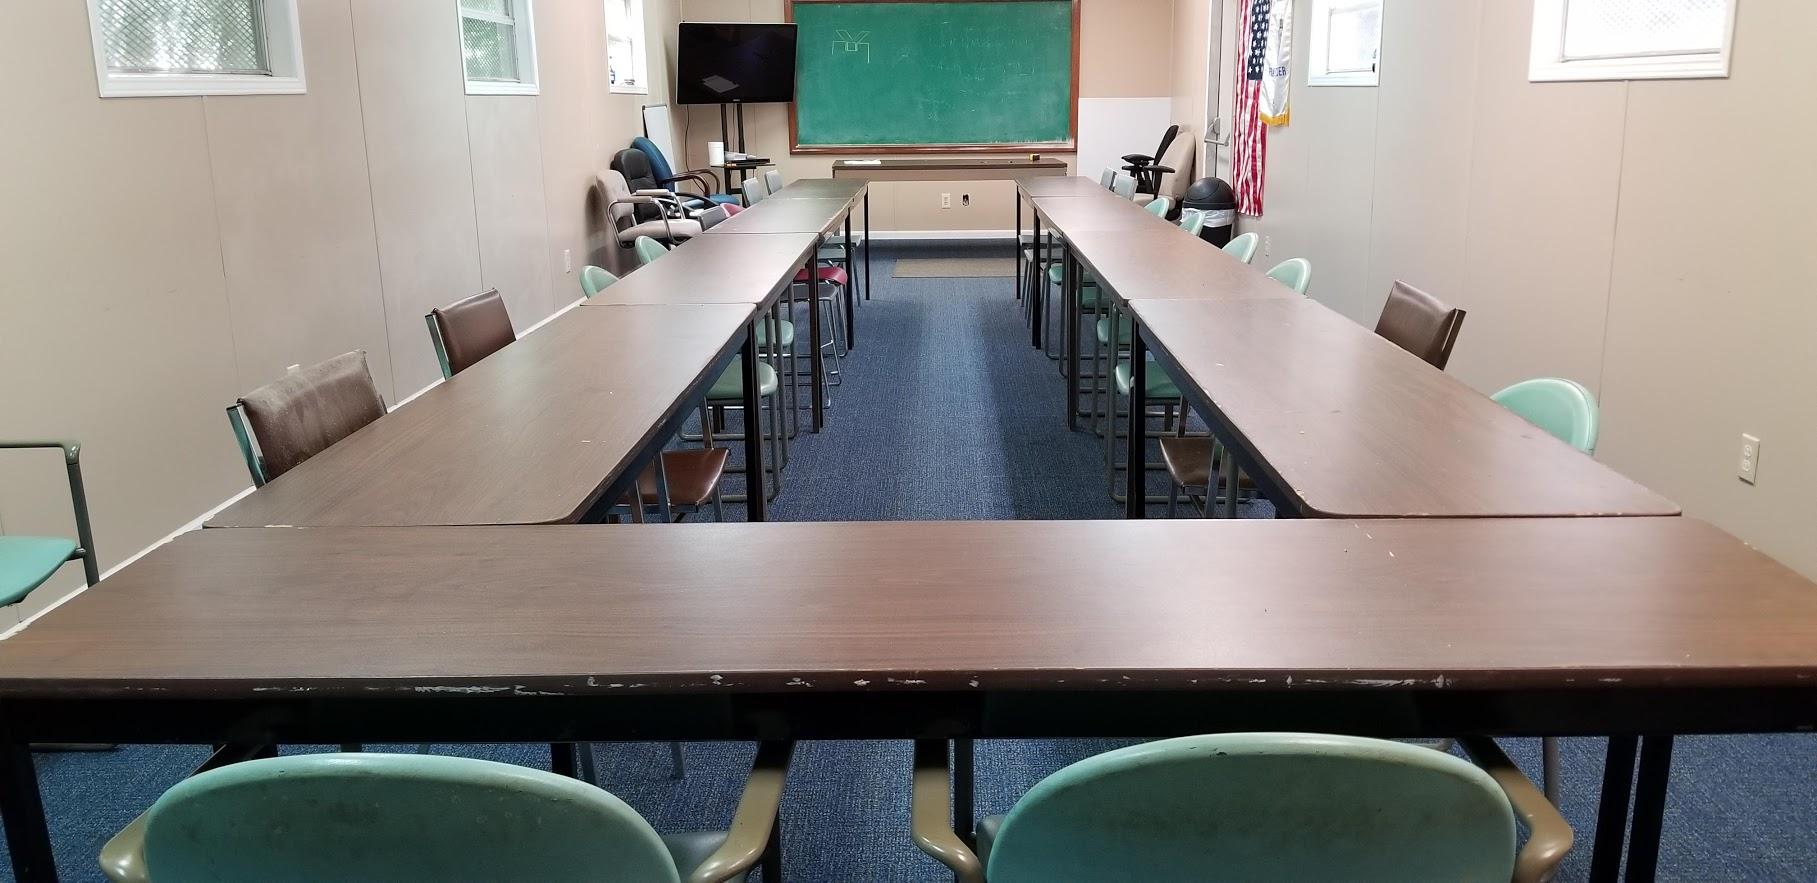 Training Range Classroom